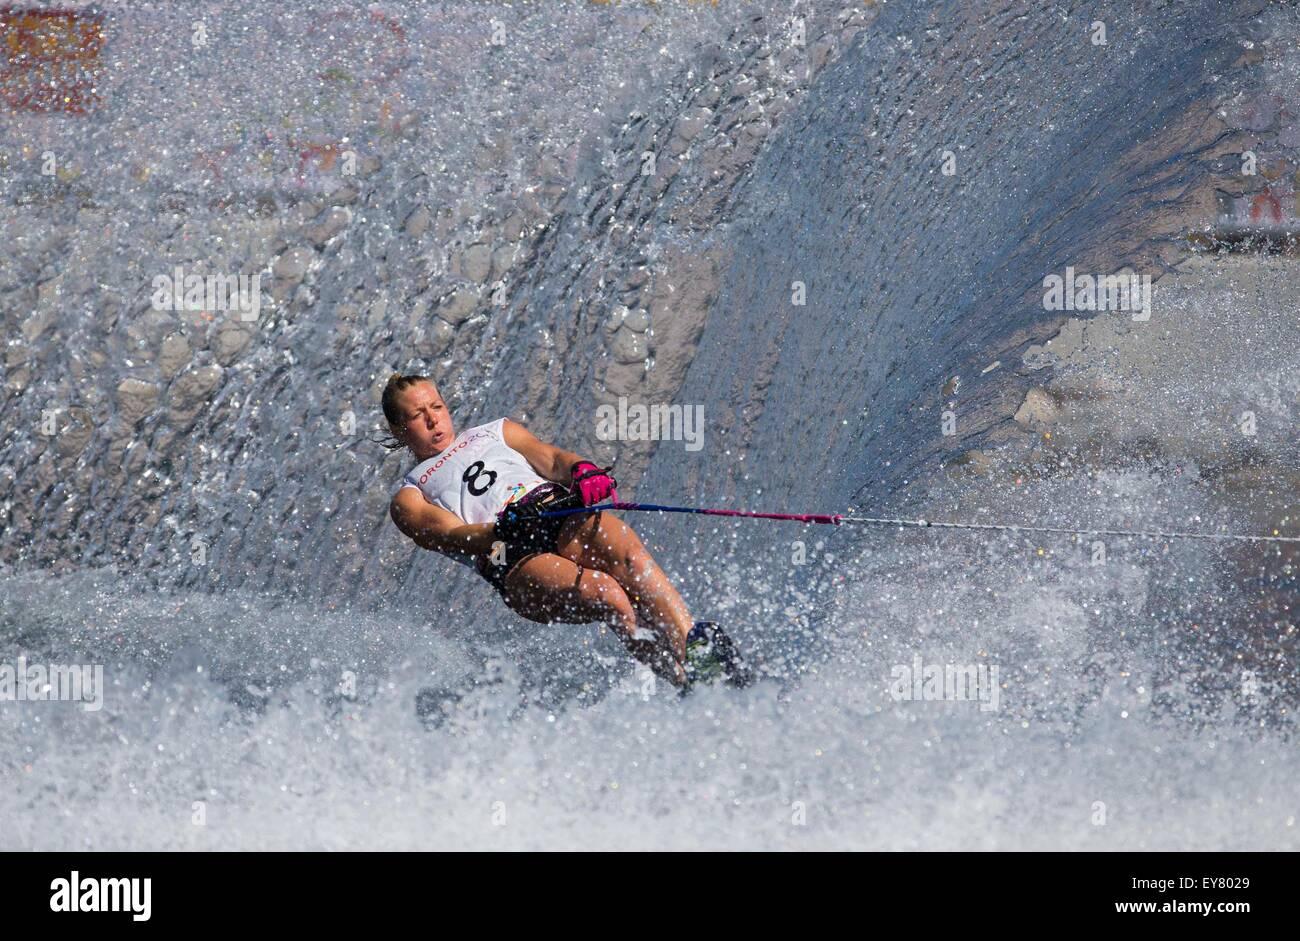 Toronto, Kanada. 23. Juli 2015. Whitney McClintock von Kanada konkurriert während der Frauen Slalom Finale Stockbild